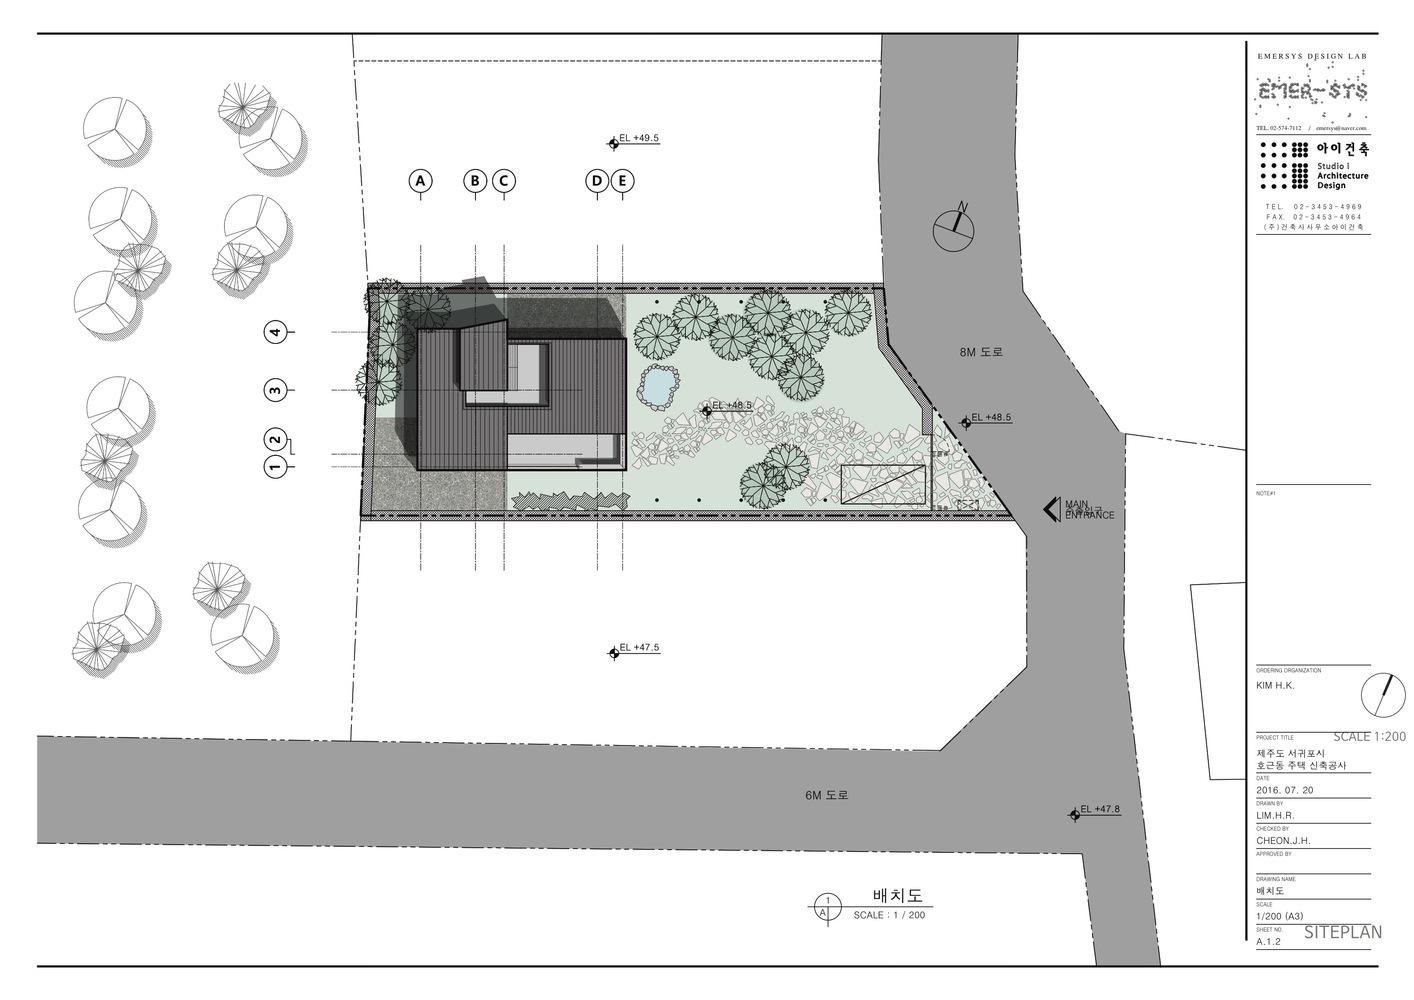 Maison de grand bleu janghwan cheon studio i site plan